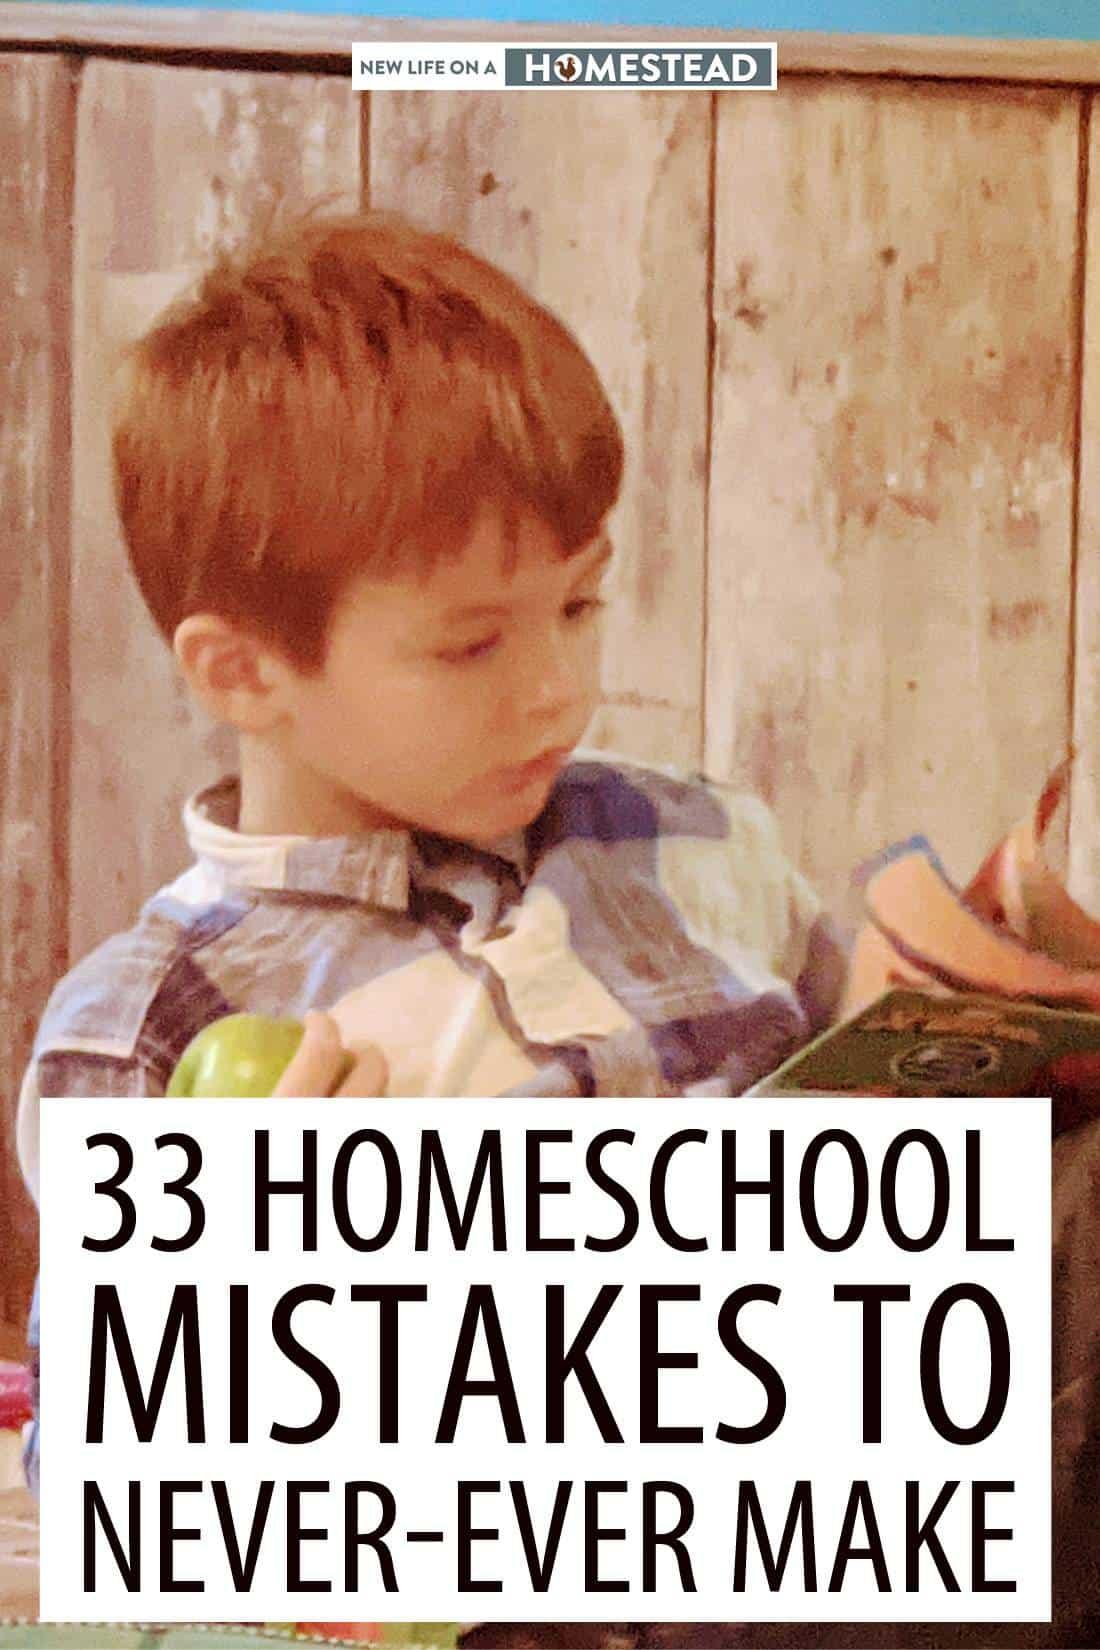 homeschooling mistakes pinterest